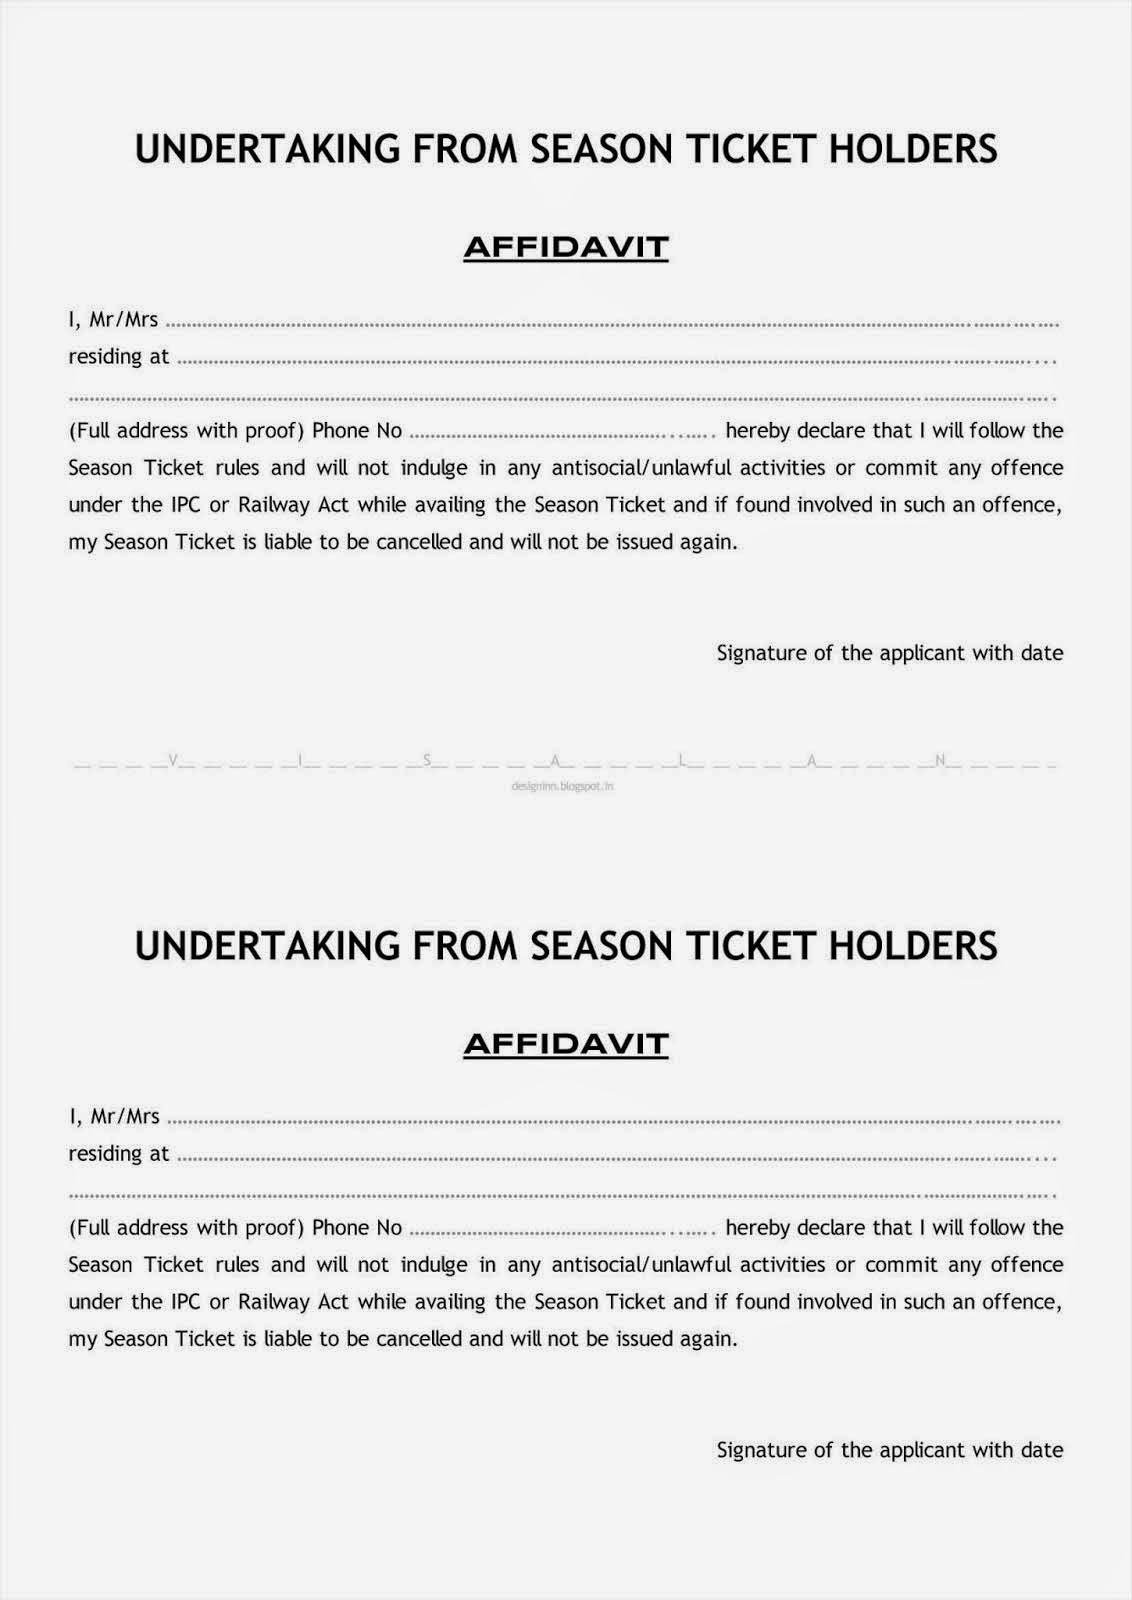 Season ticket affidavit new format altavistaventures Image collections